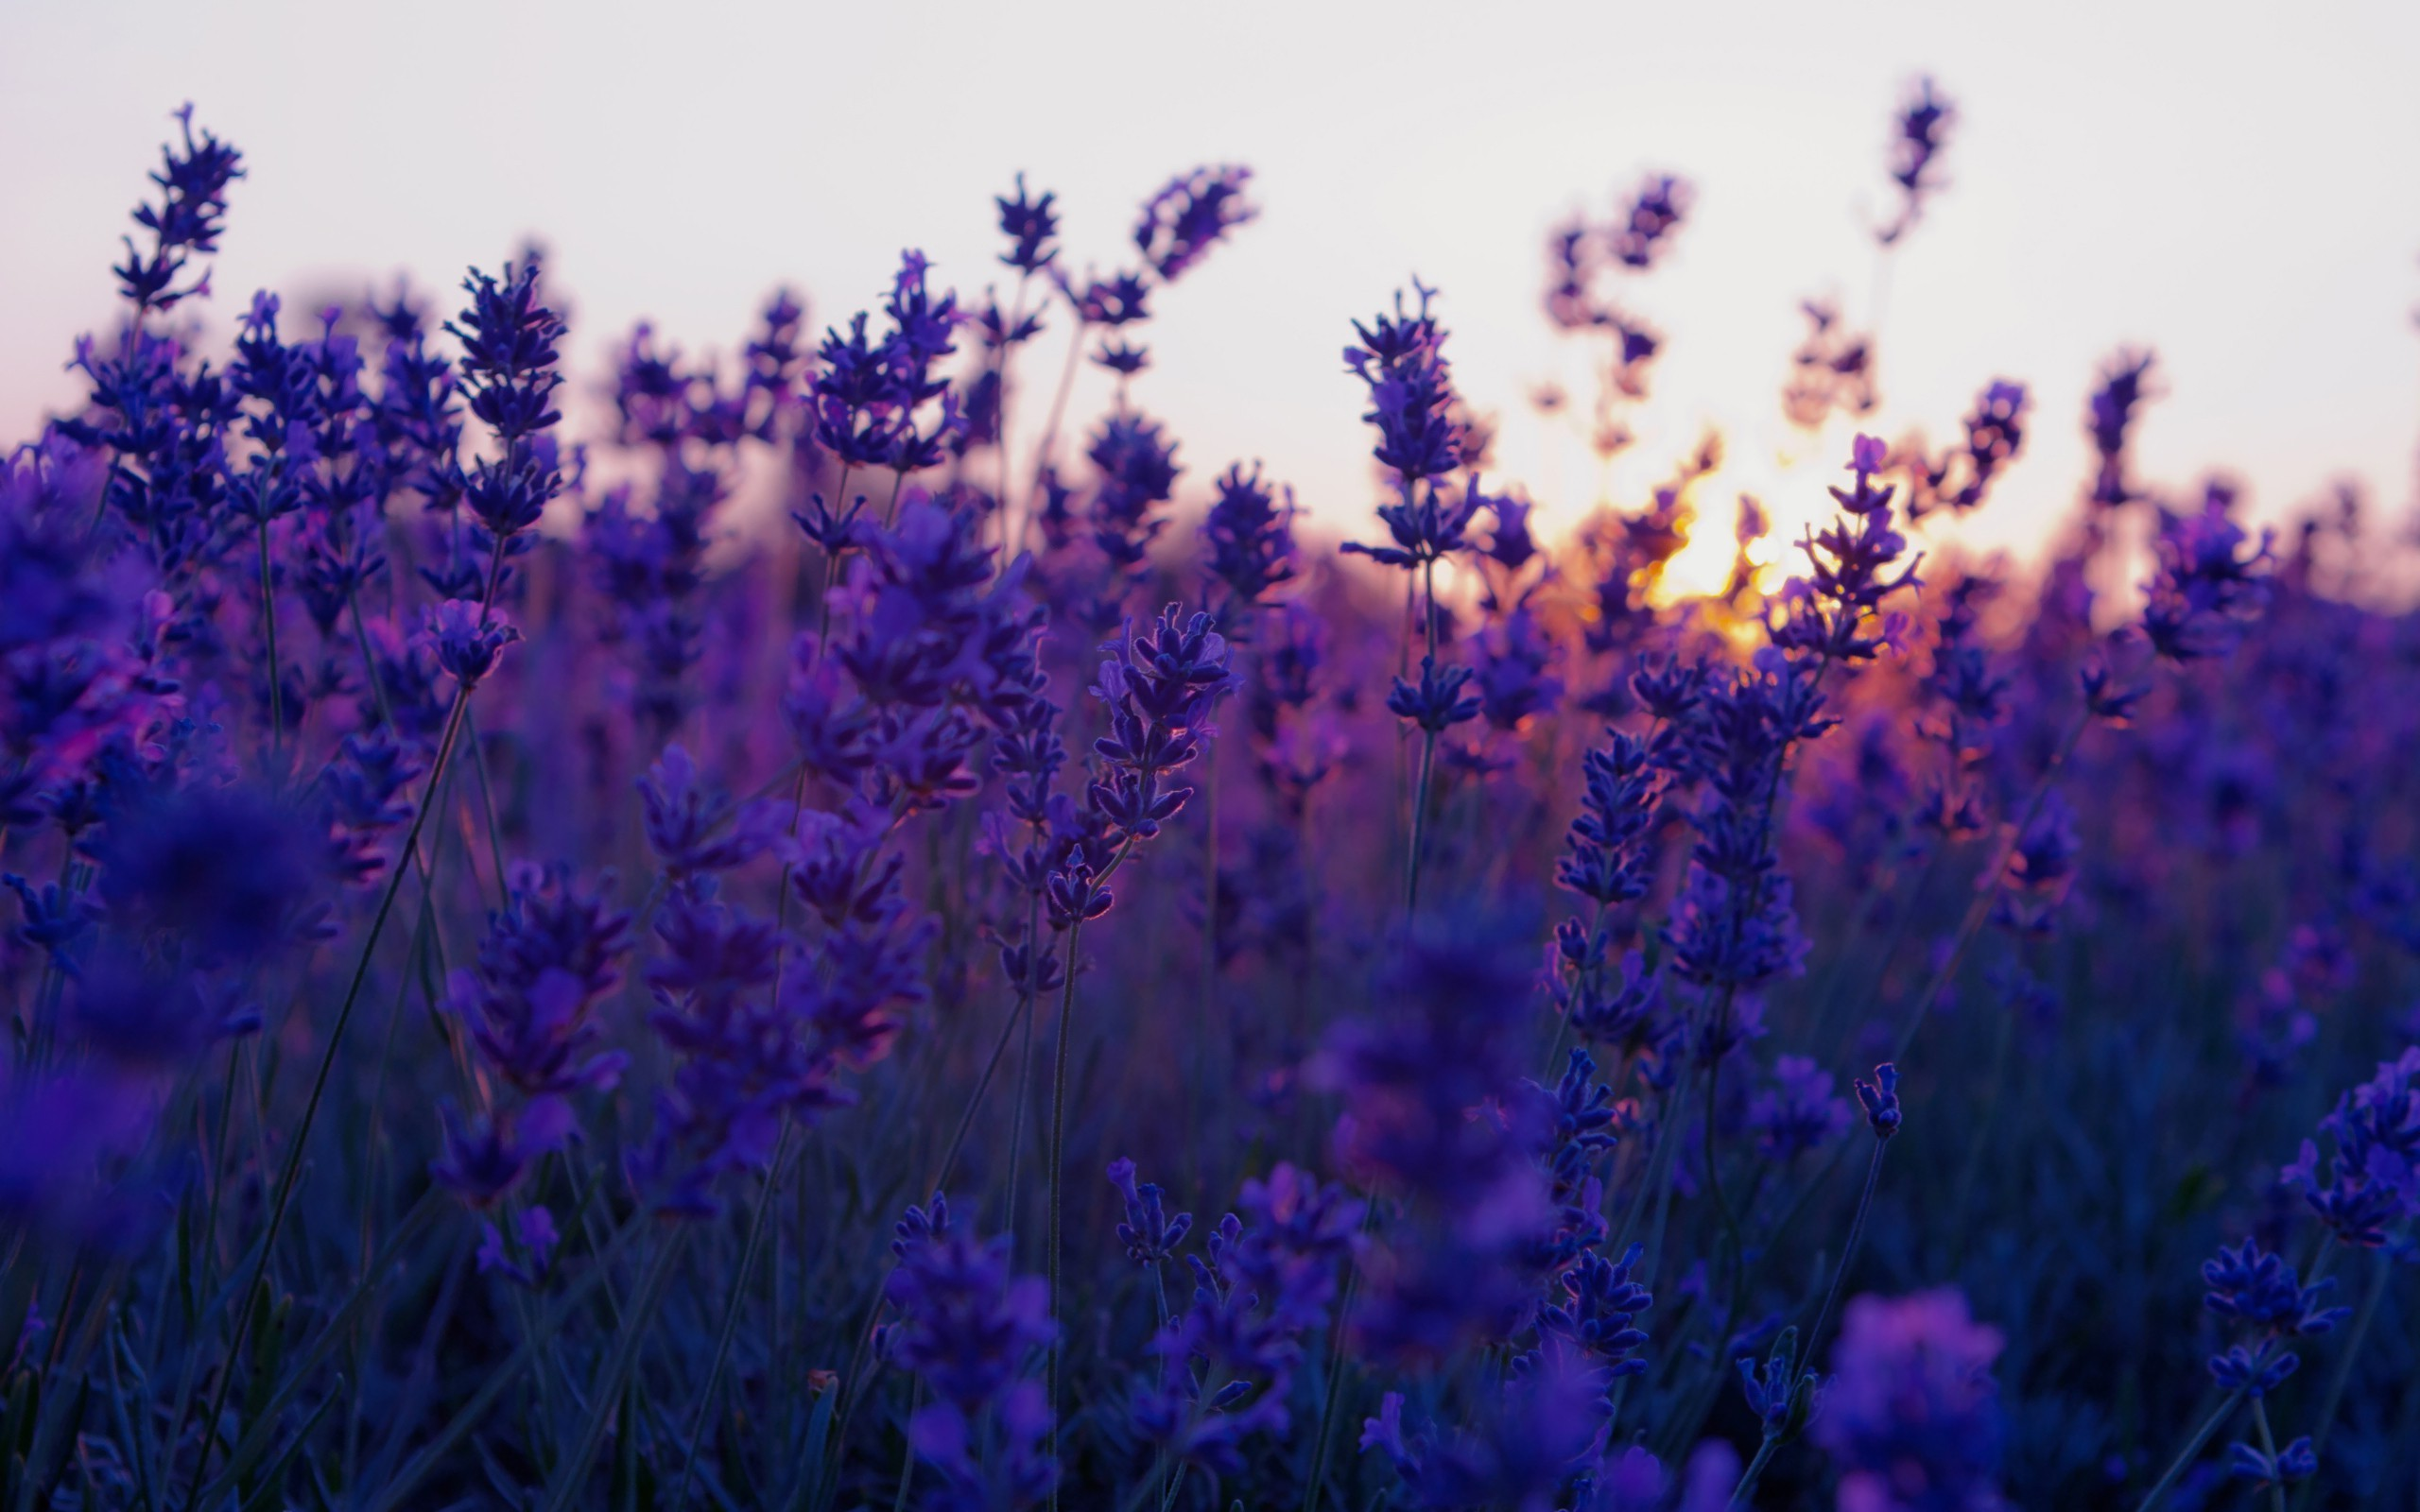 wallpaper.wiki-Lavender-Flower-HD-Background-PIC-WPE004729